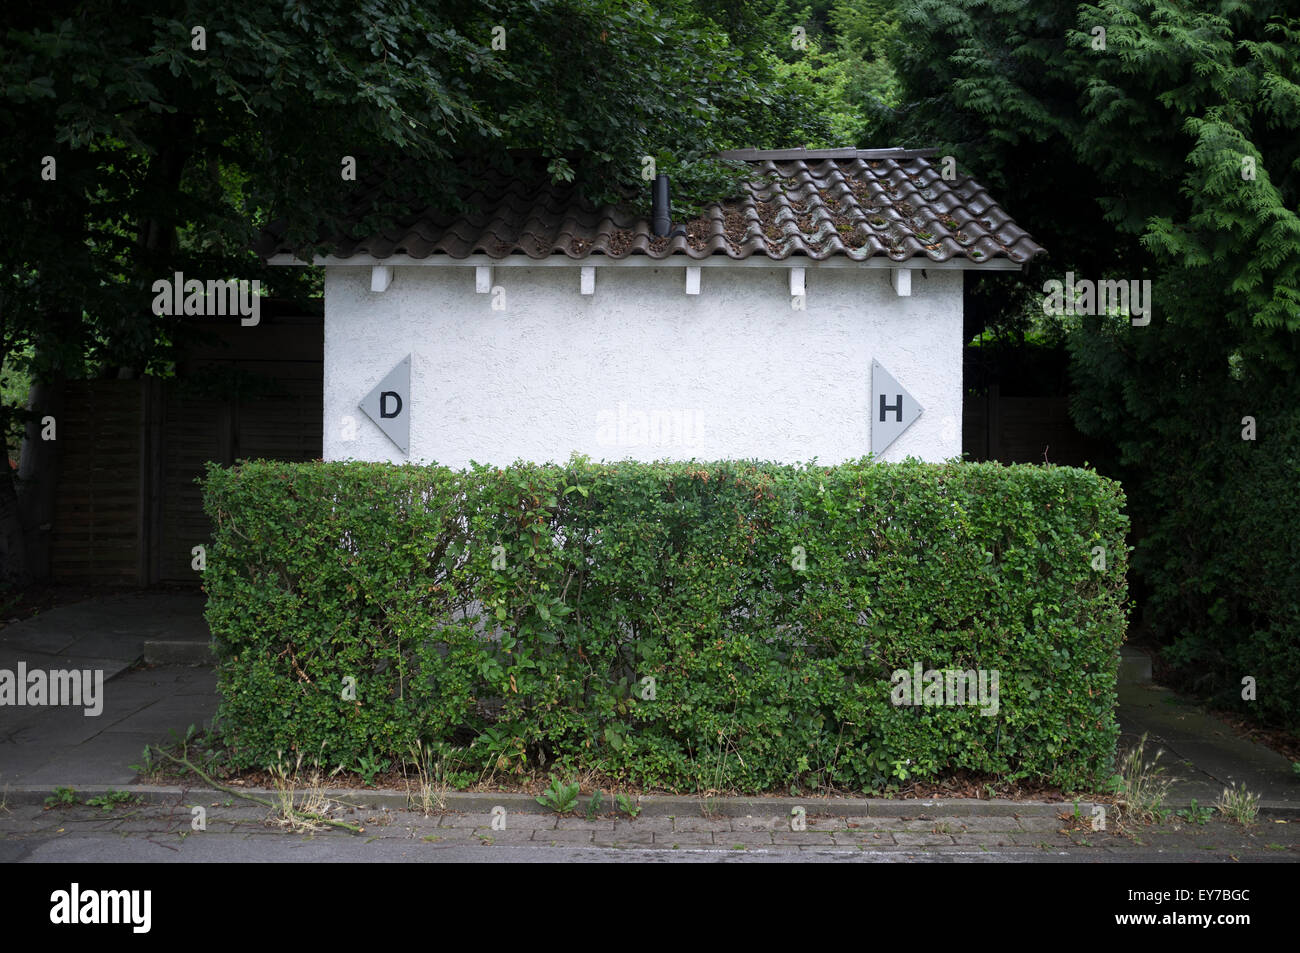 Public toilets, Herdecke, North Rhine-Westphalia, Germany. - Stock Image